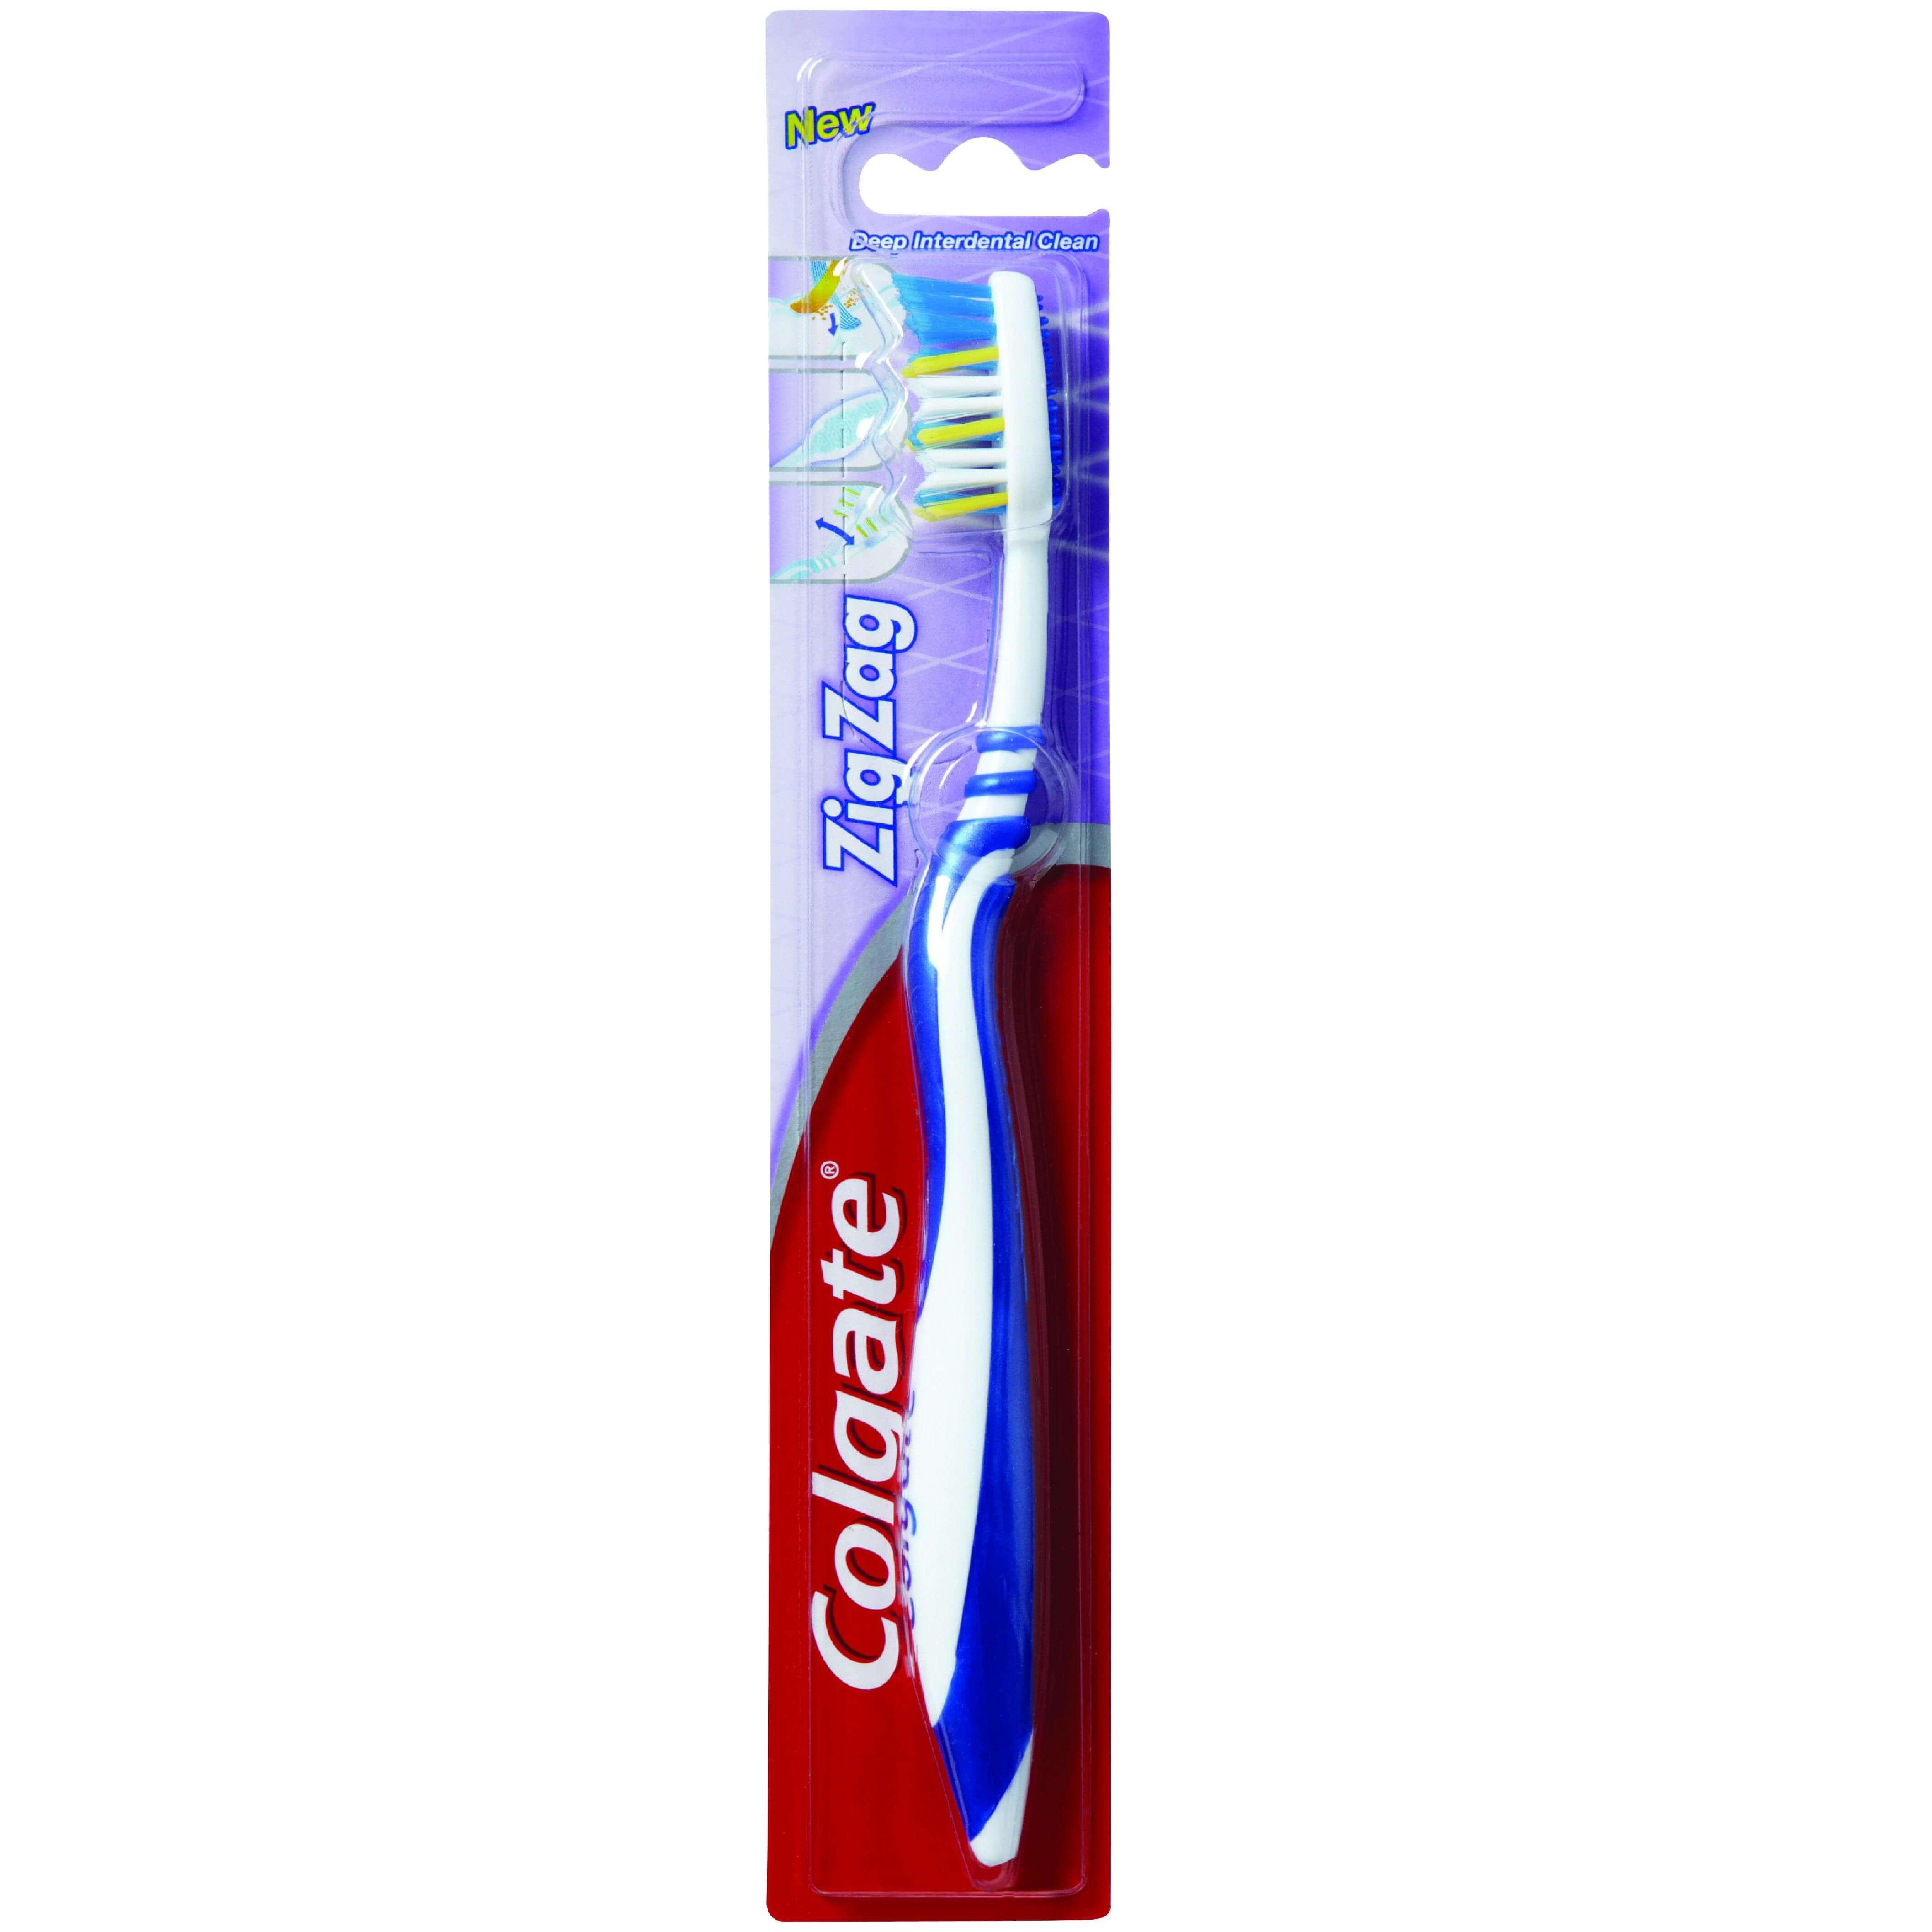 Colgate ZigZag Medium Οδοντόβουρτσα Μέτρια που Βοηθά στον Καθαρισμό των Δυσπρόσιτων Σημείων 1 Τεμάχιο